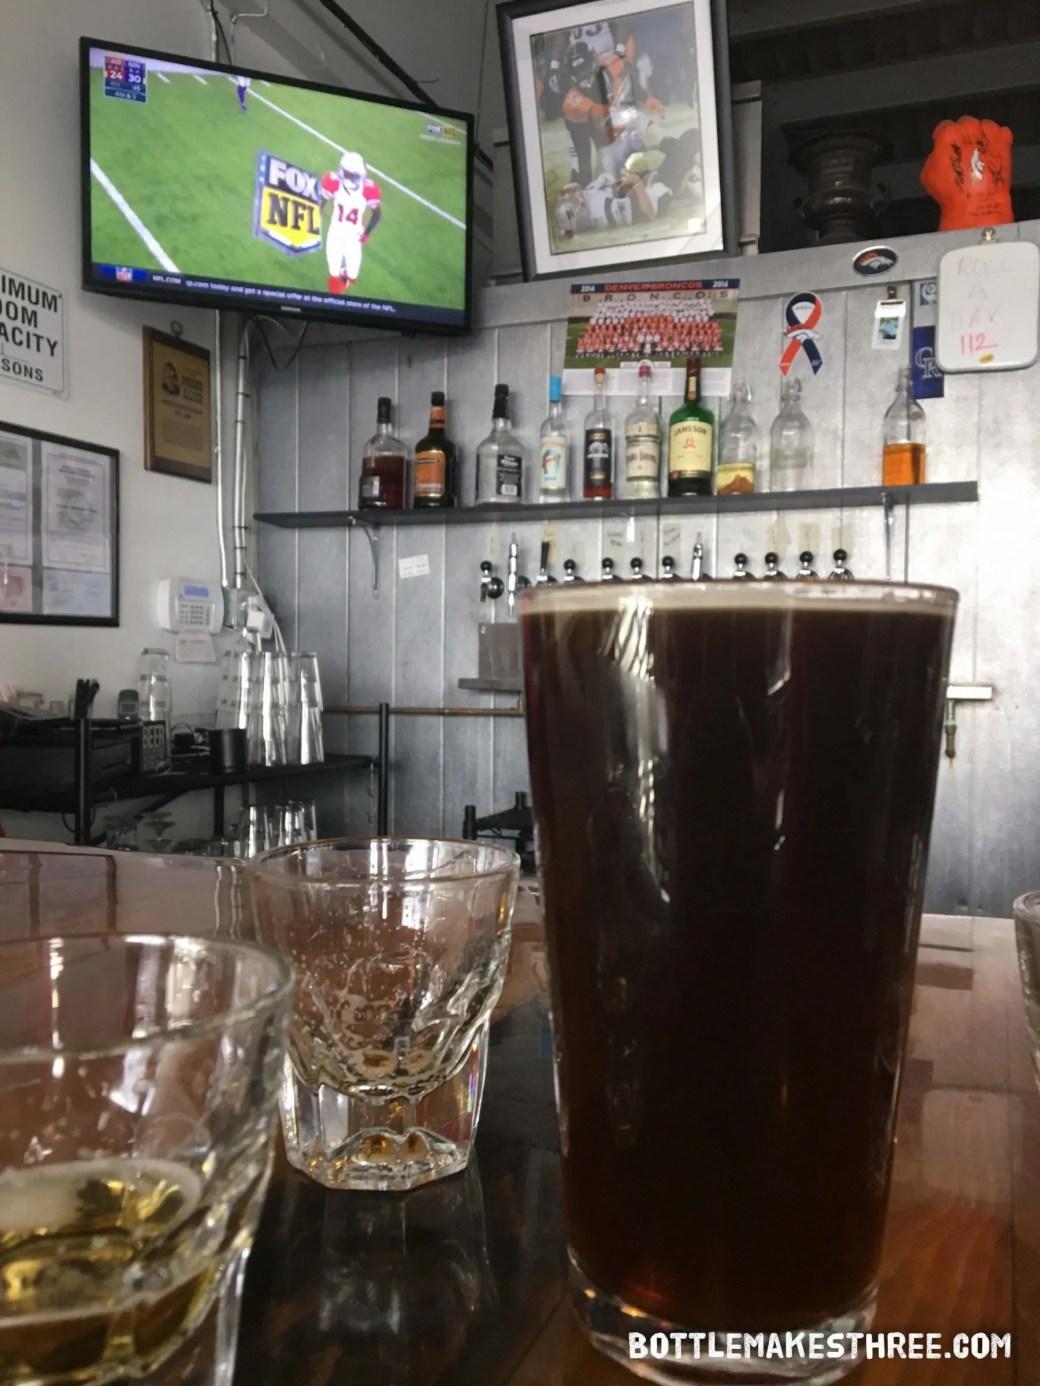 Creede Brewing Company in Denver, CO | BottleMakesThree.com